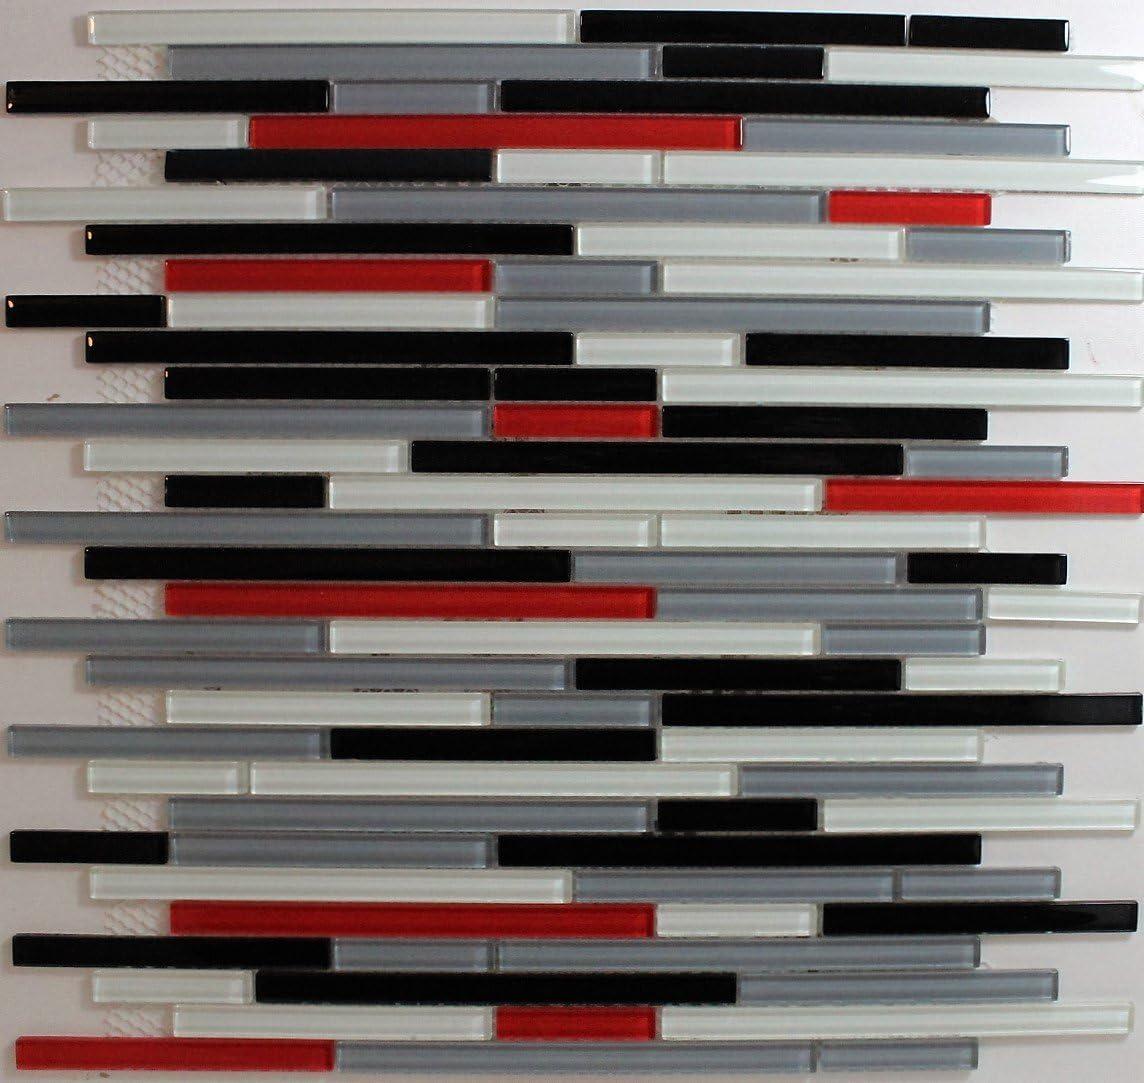 Red White Black Grey Glass Mosaic Backsplash Tile 1 Sheet Glass Backsplash Tiles For Kitchen Bathroom Walls Amazon Com